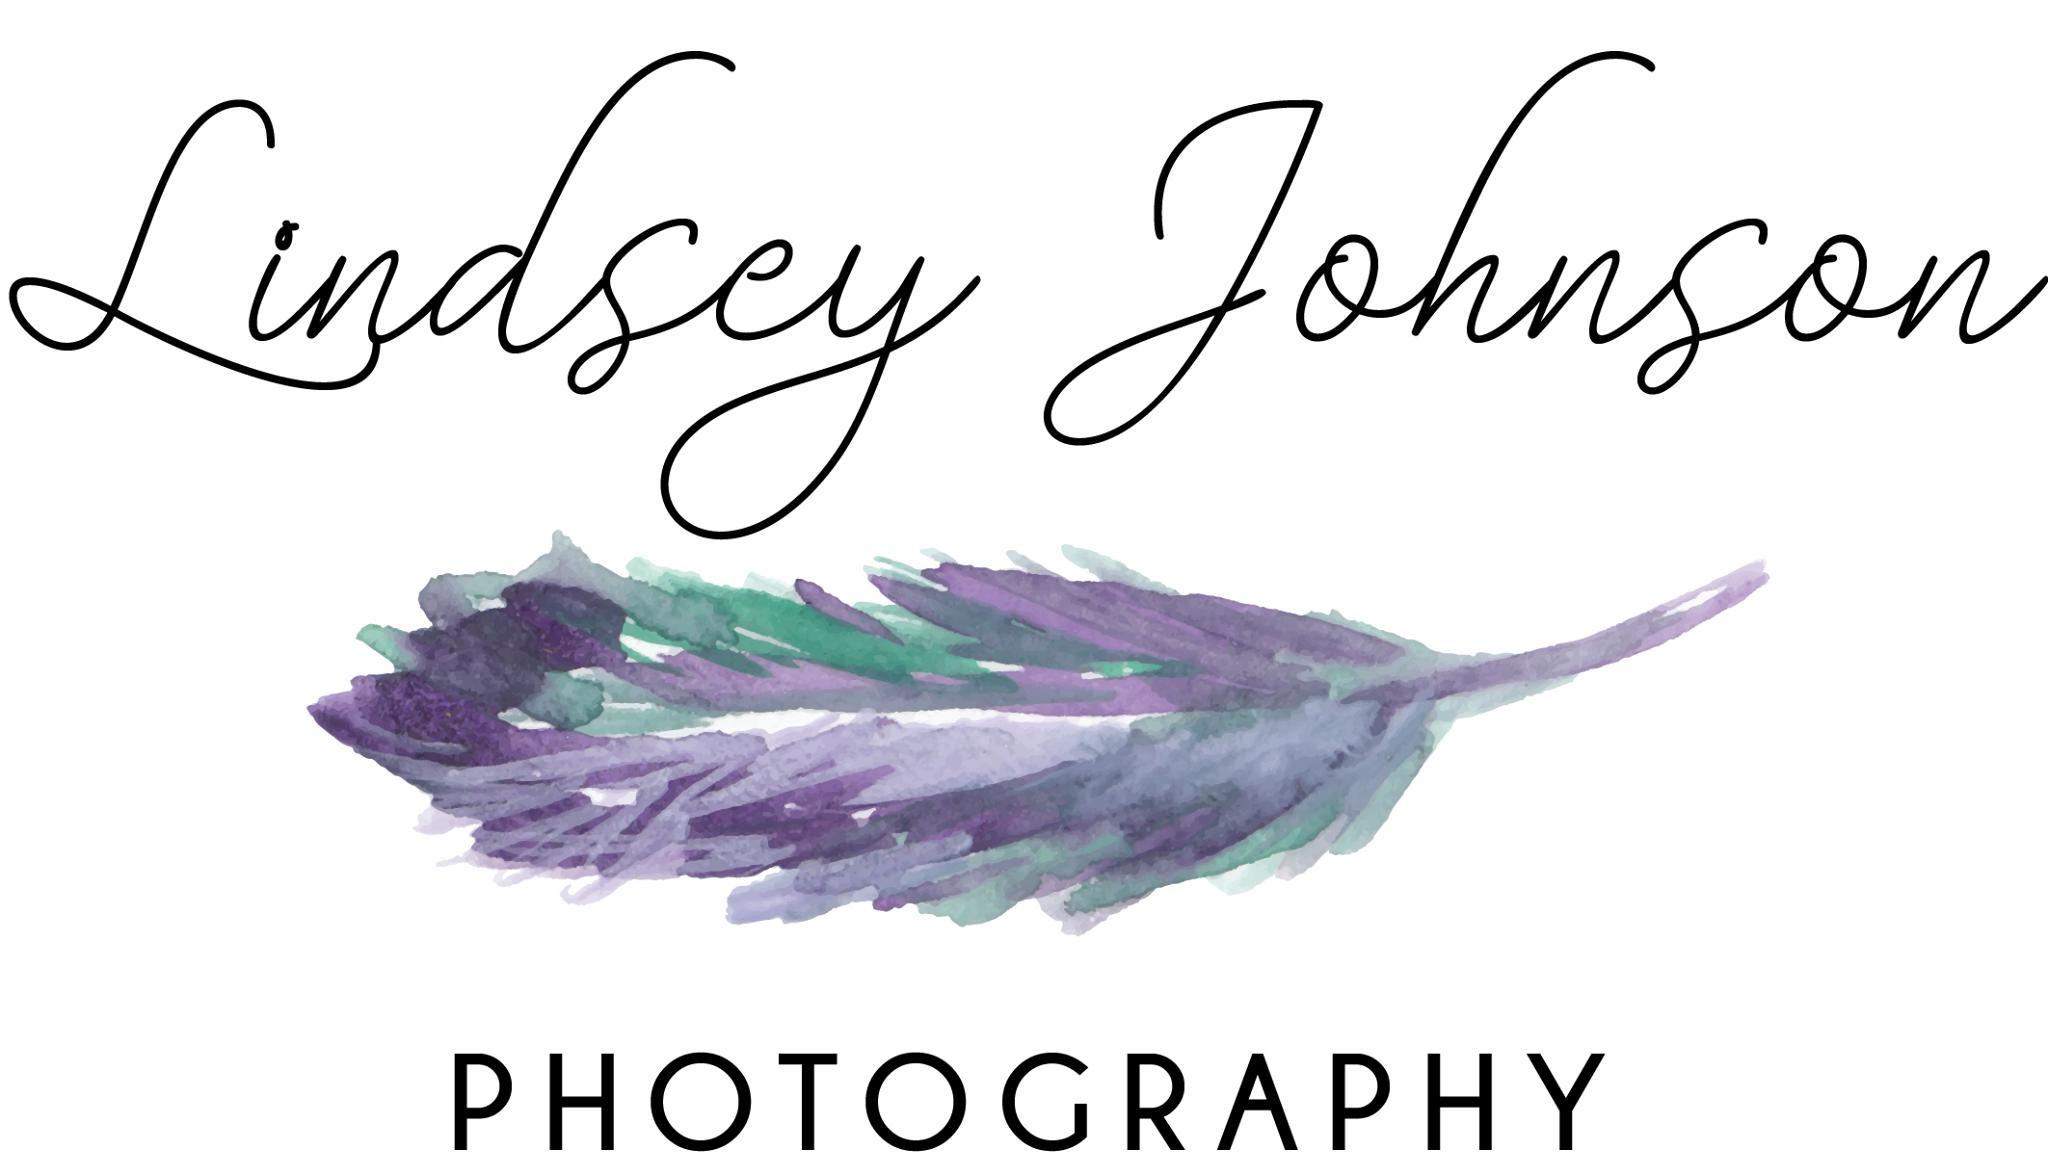 Lindsey Johnson Photography